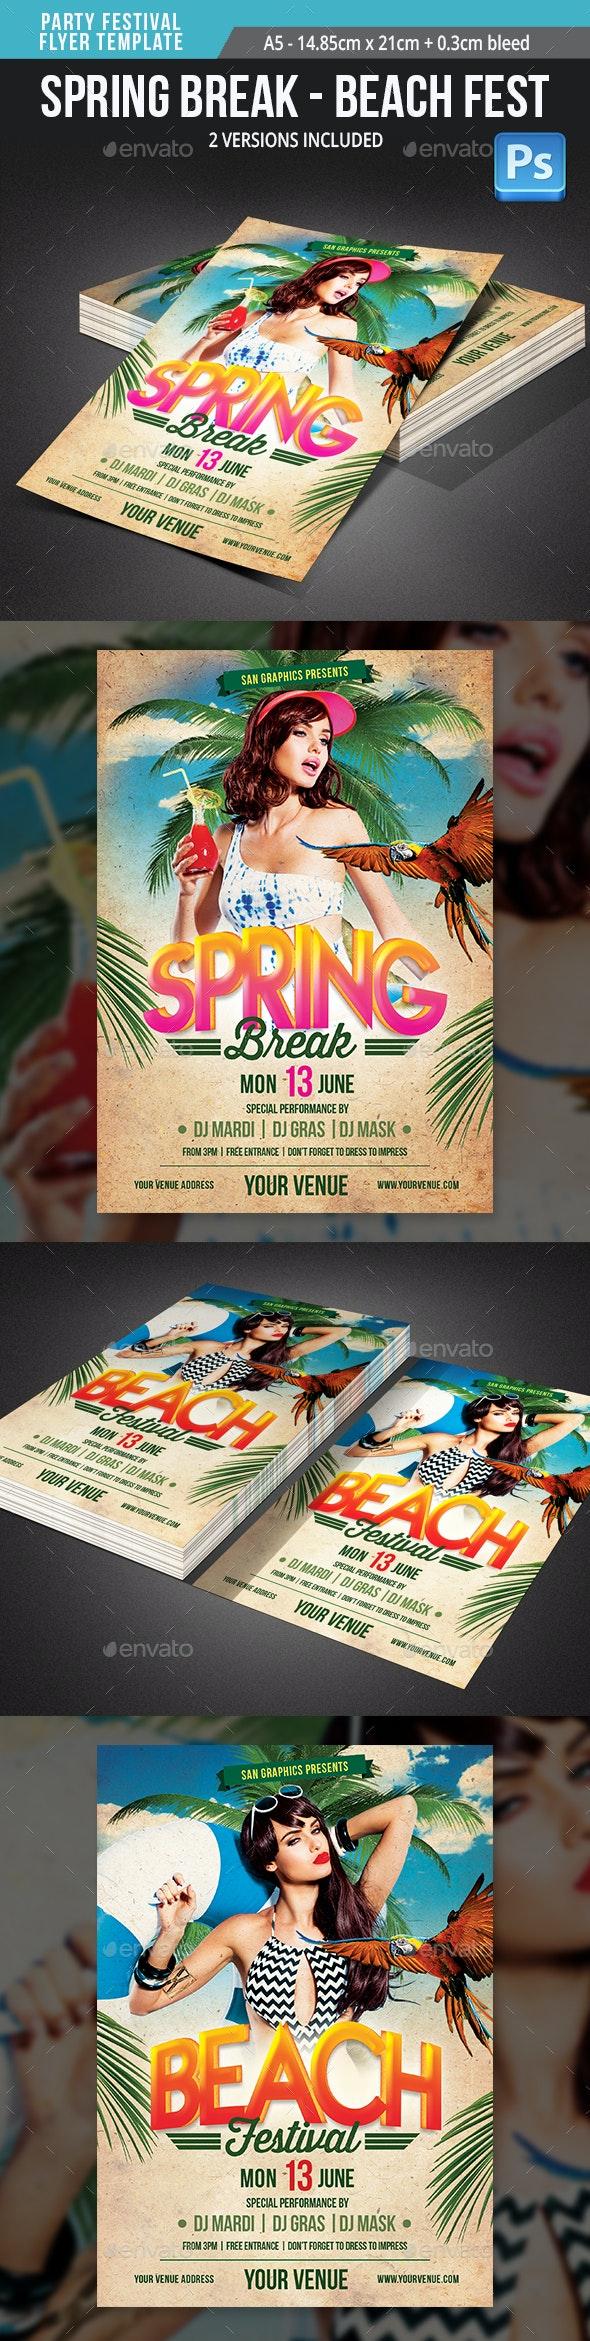 Spring Break Summer Beach Festival Flyer Template - Flyers Print Templates